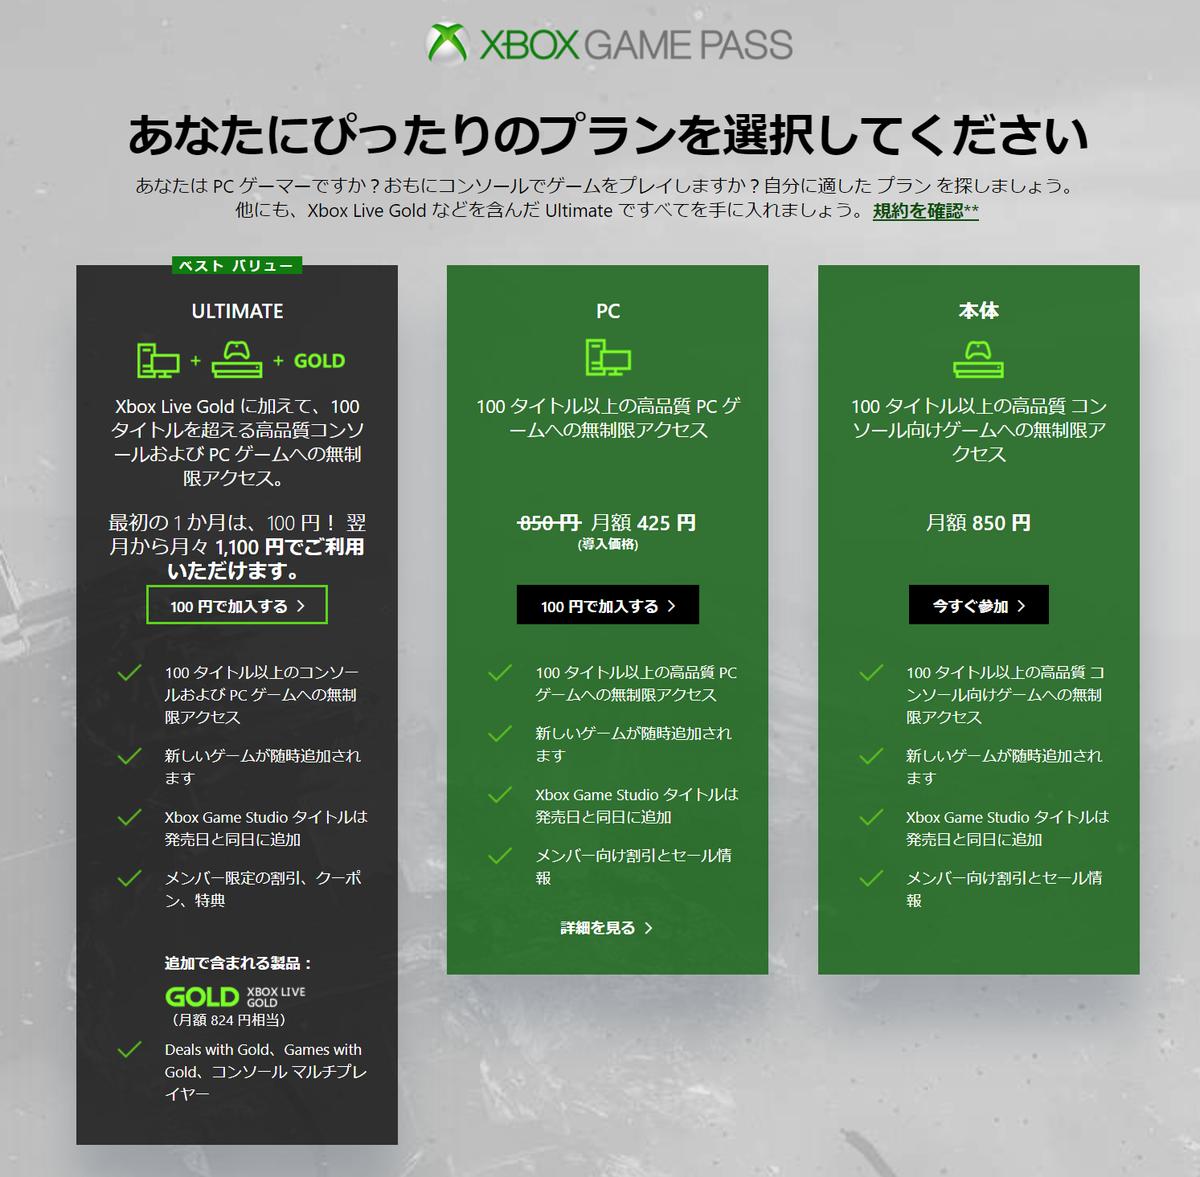 f:id:game-bakari:20200426203758p:plain